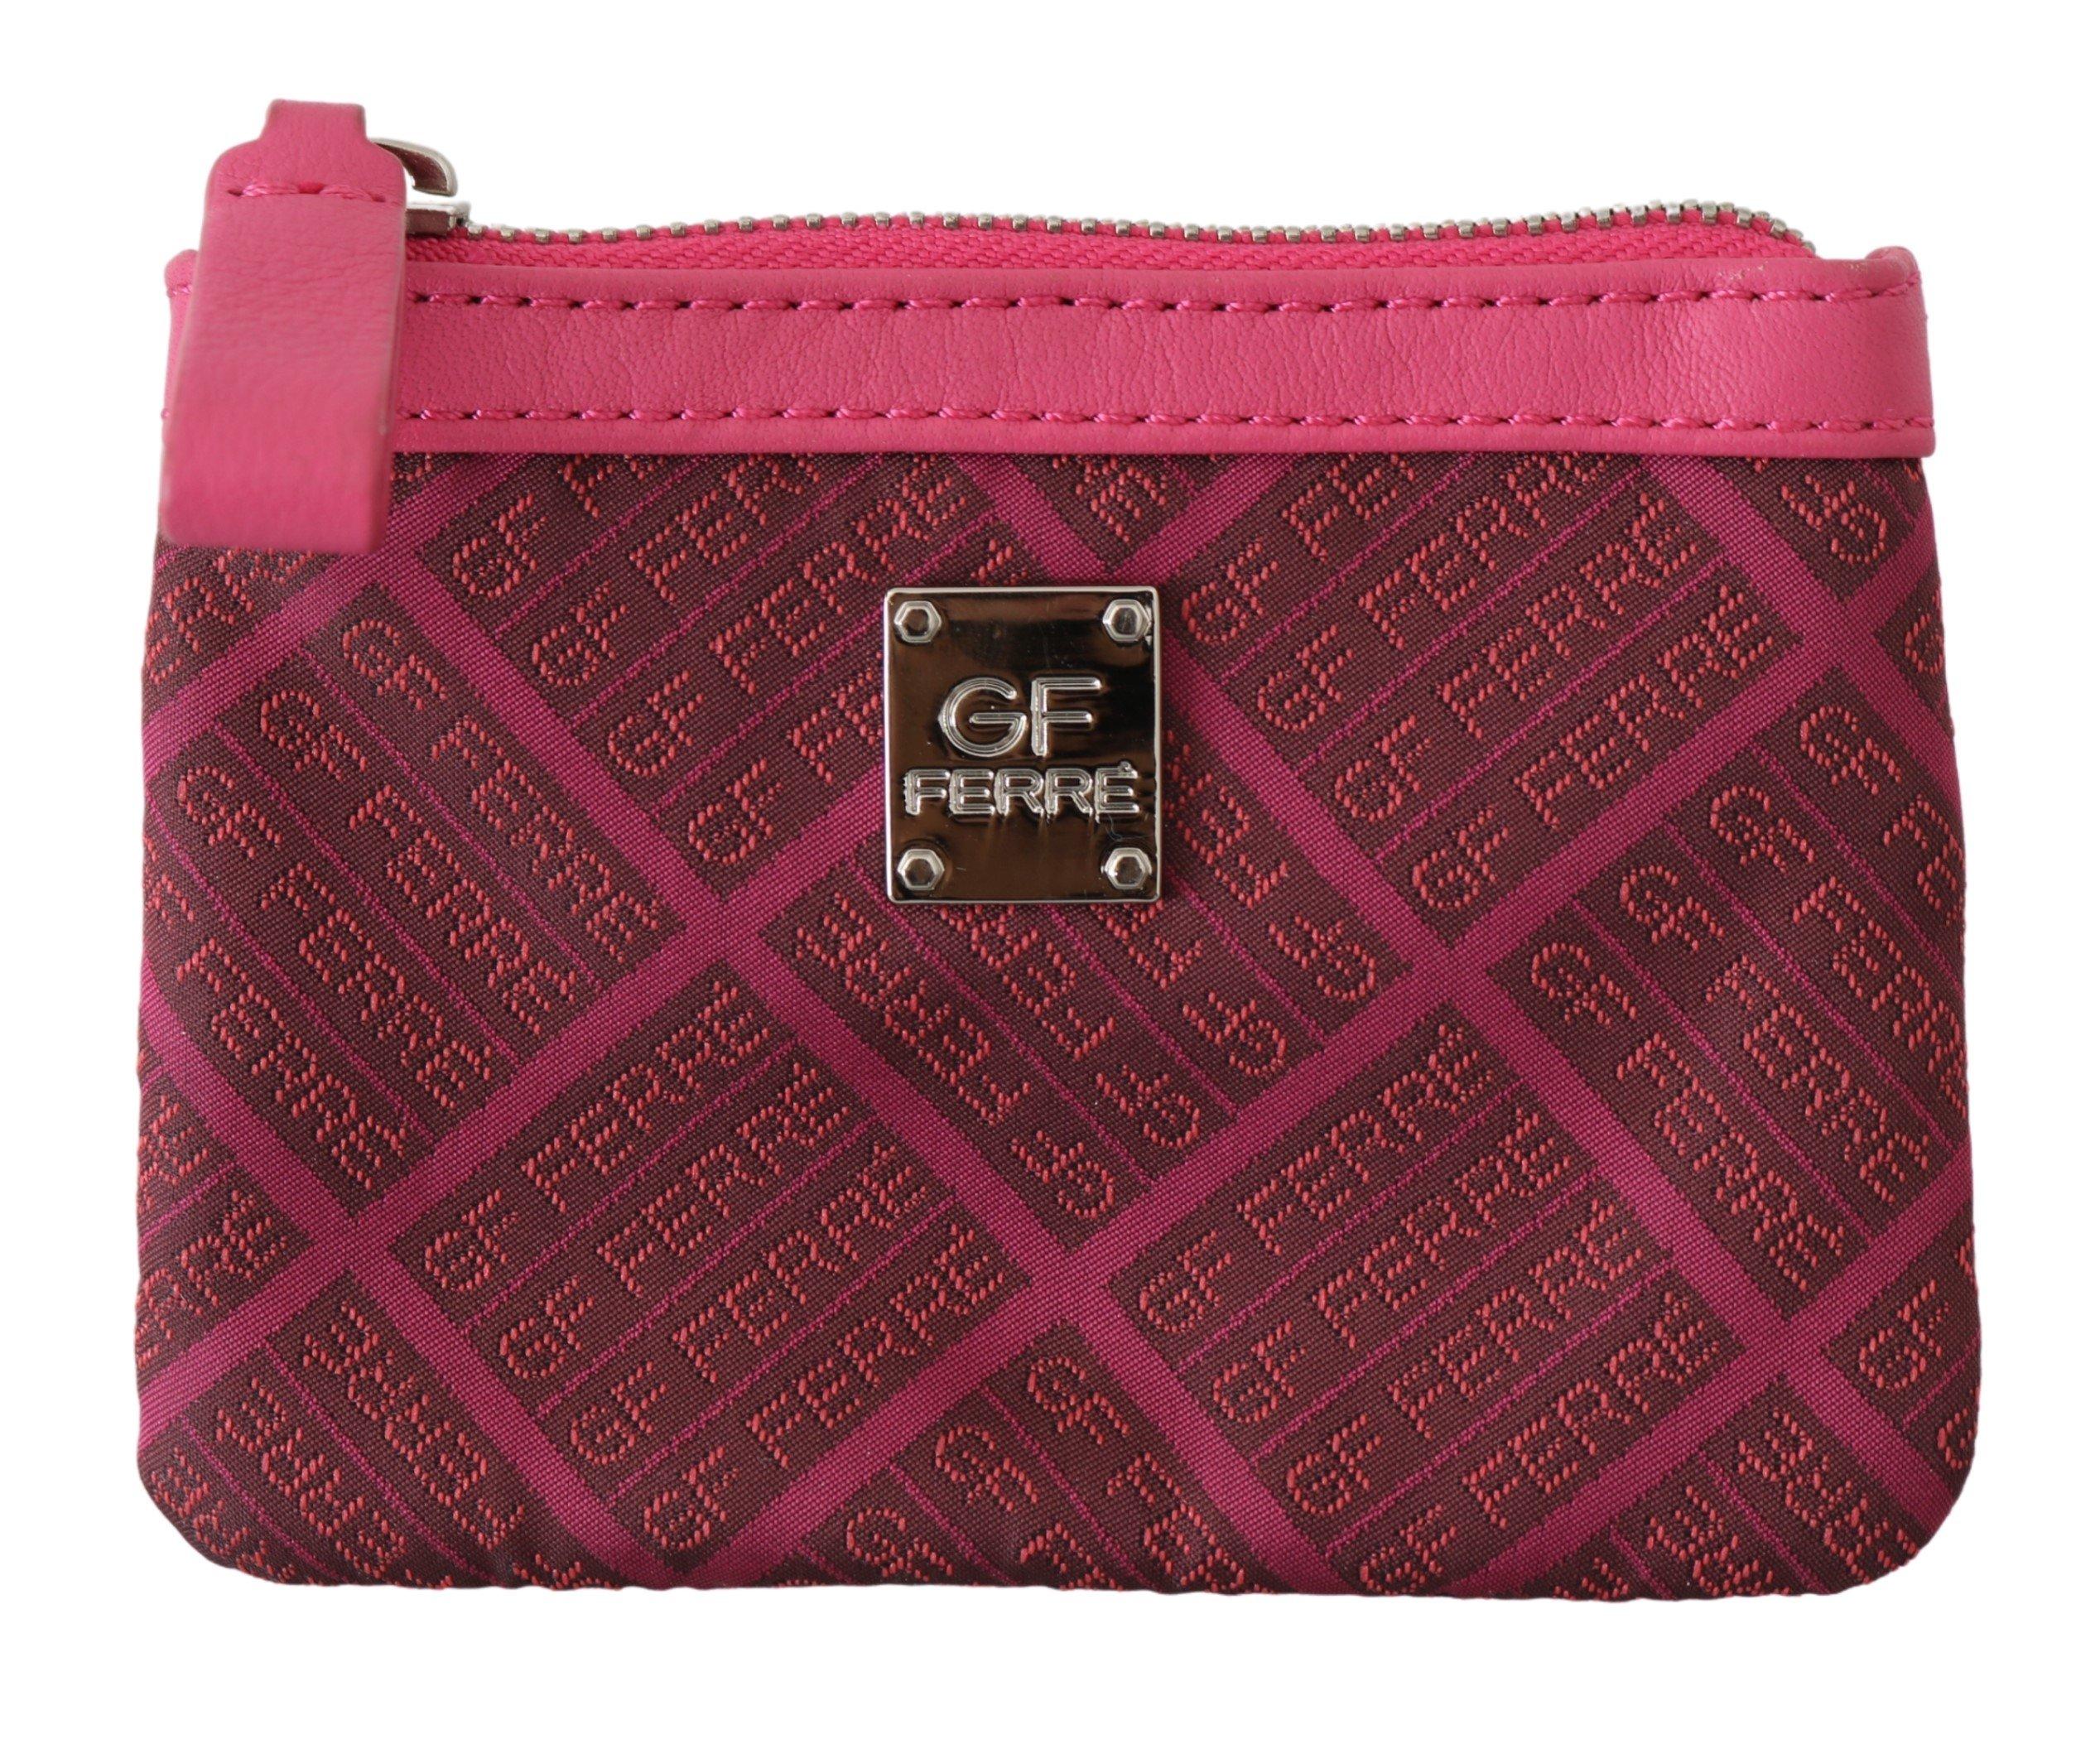 GF Ferre Women's Brand Pattern Logo Textile Wallet Pink VAS9158